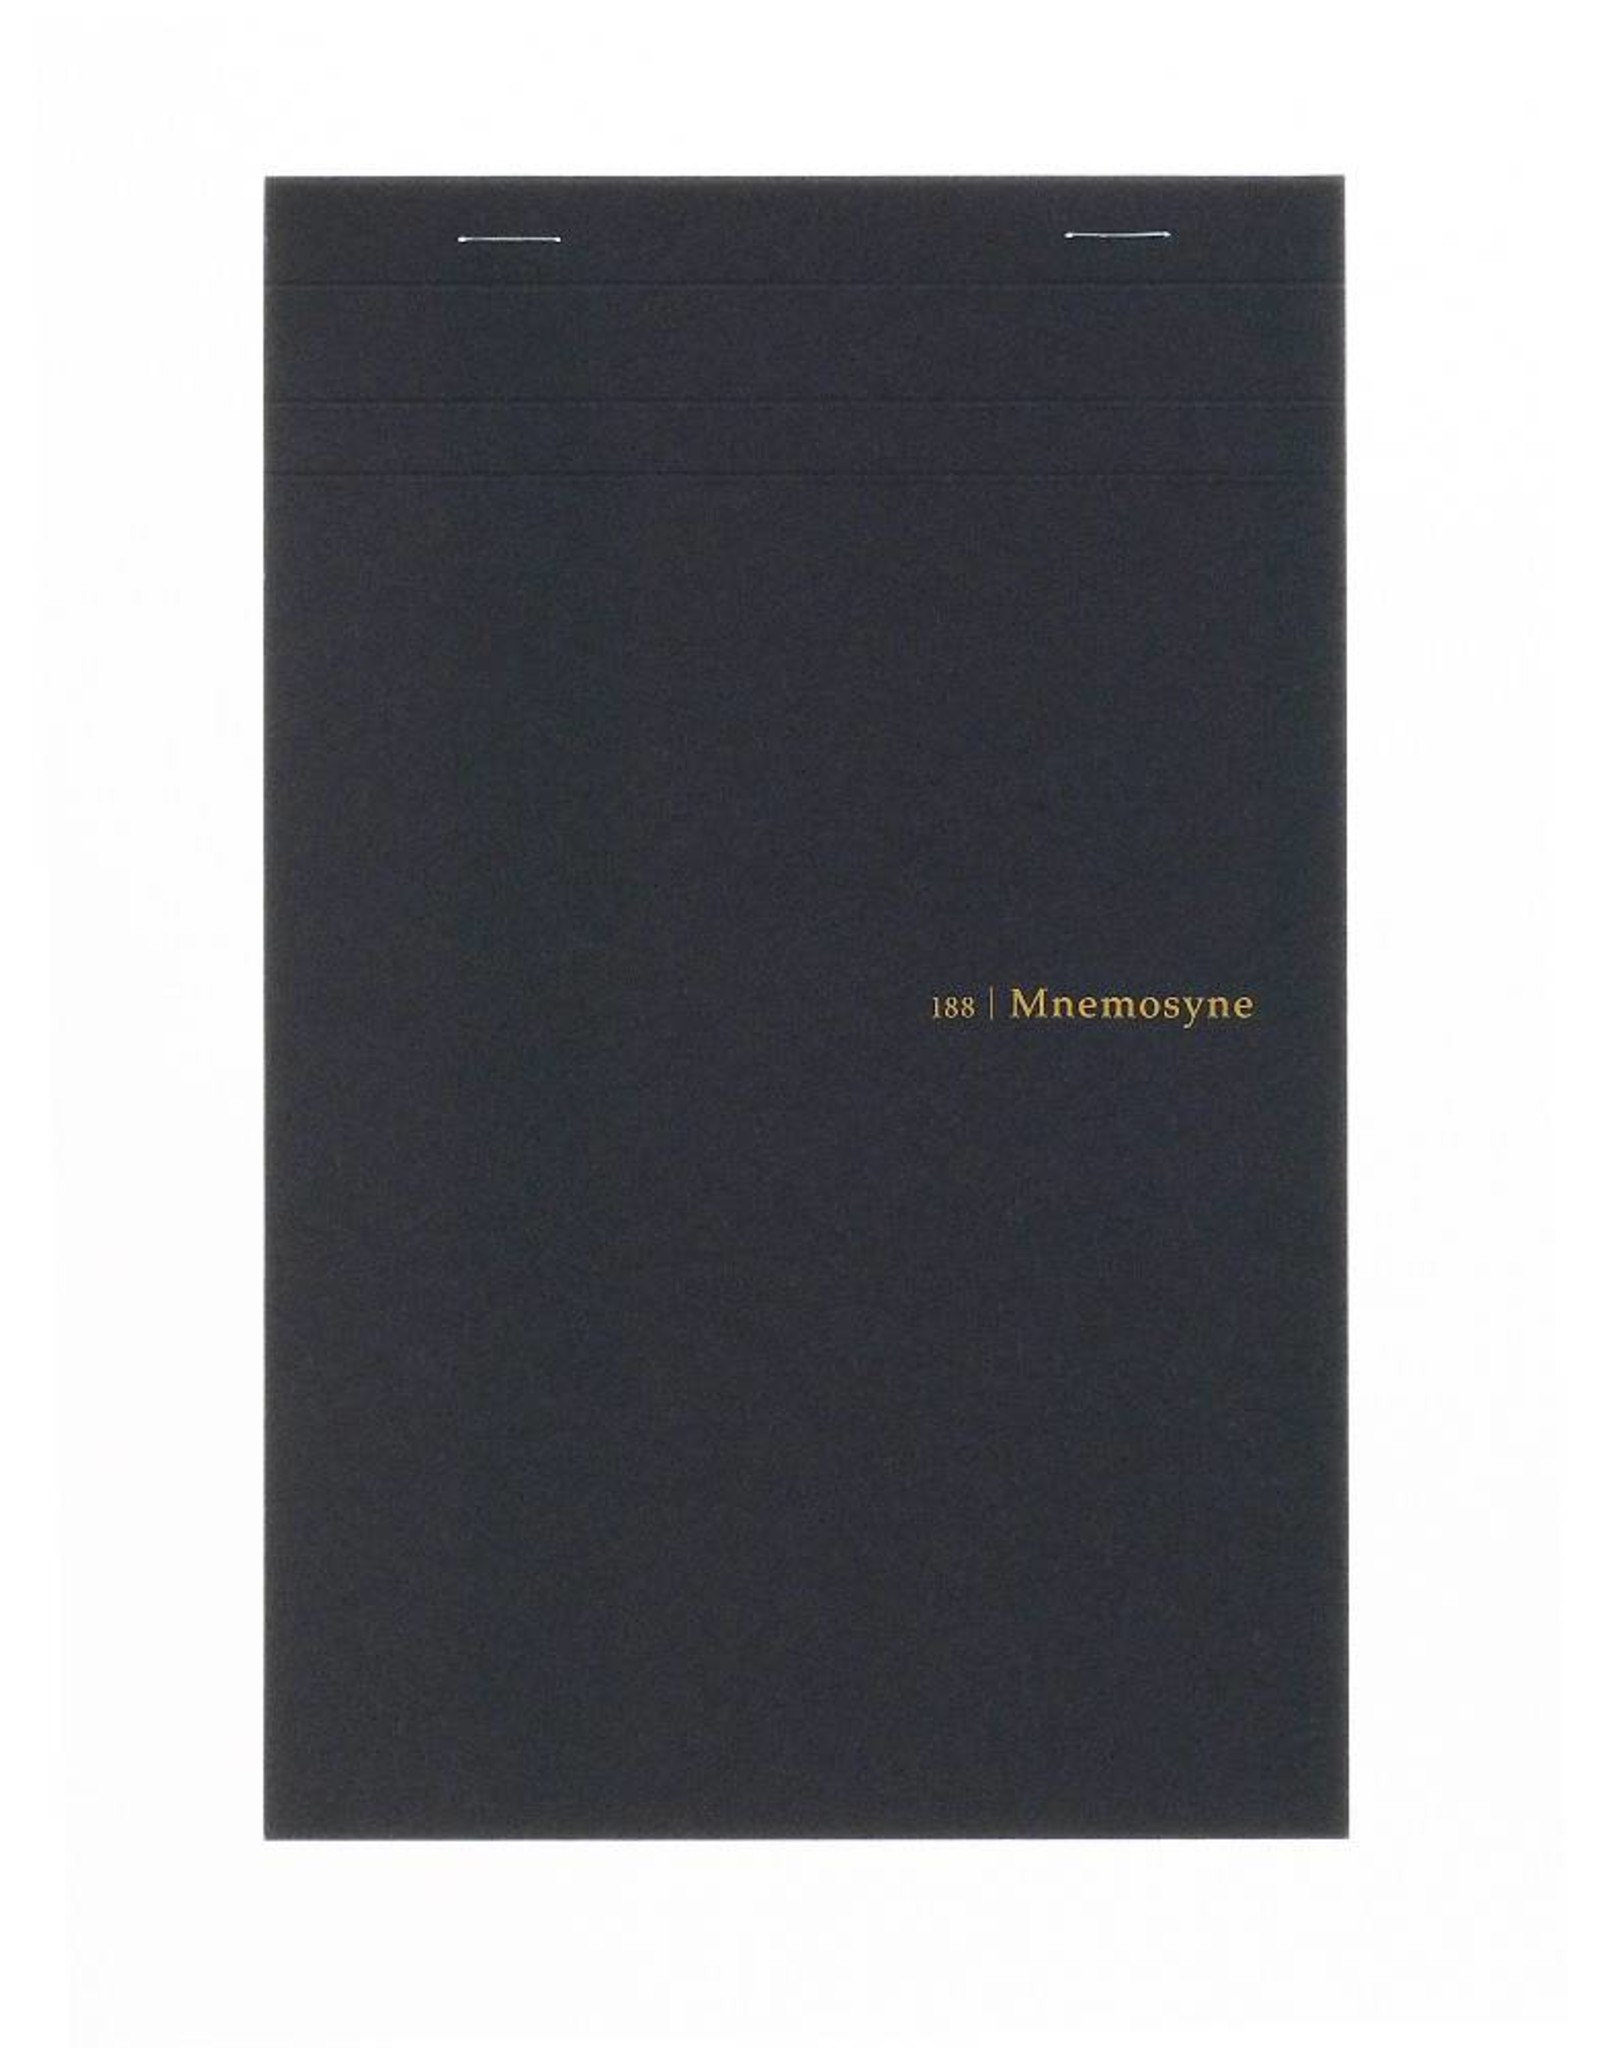 MARUMAN MNEMOSYNE NOTEPAD 5MM SQUARED A5